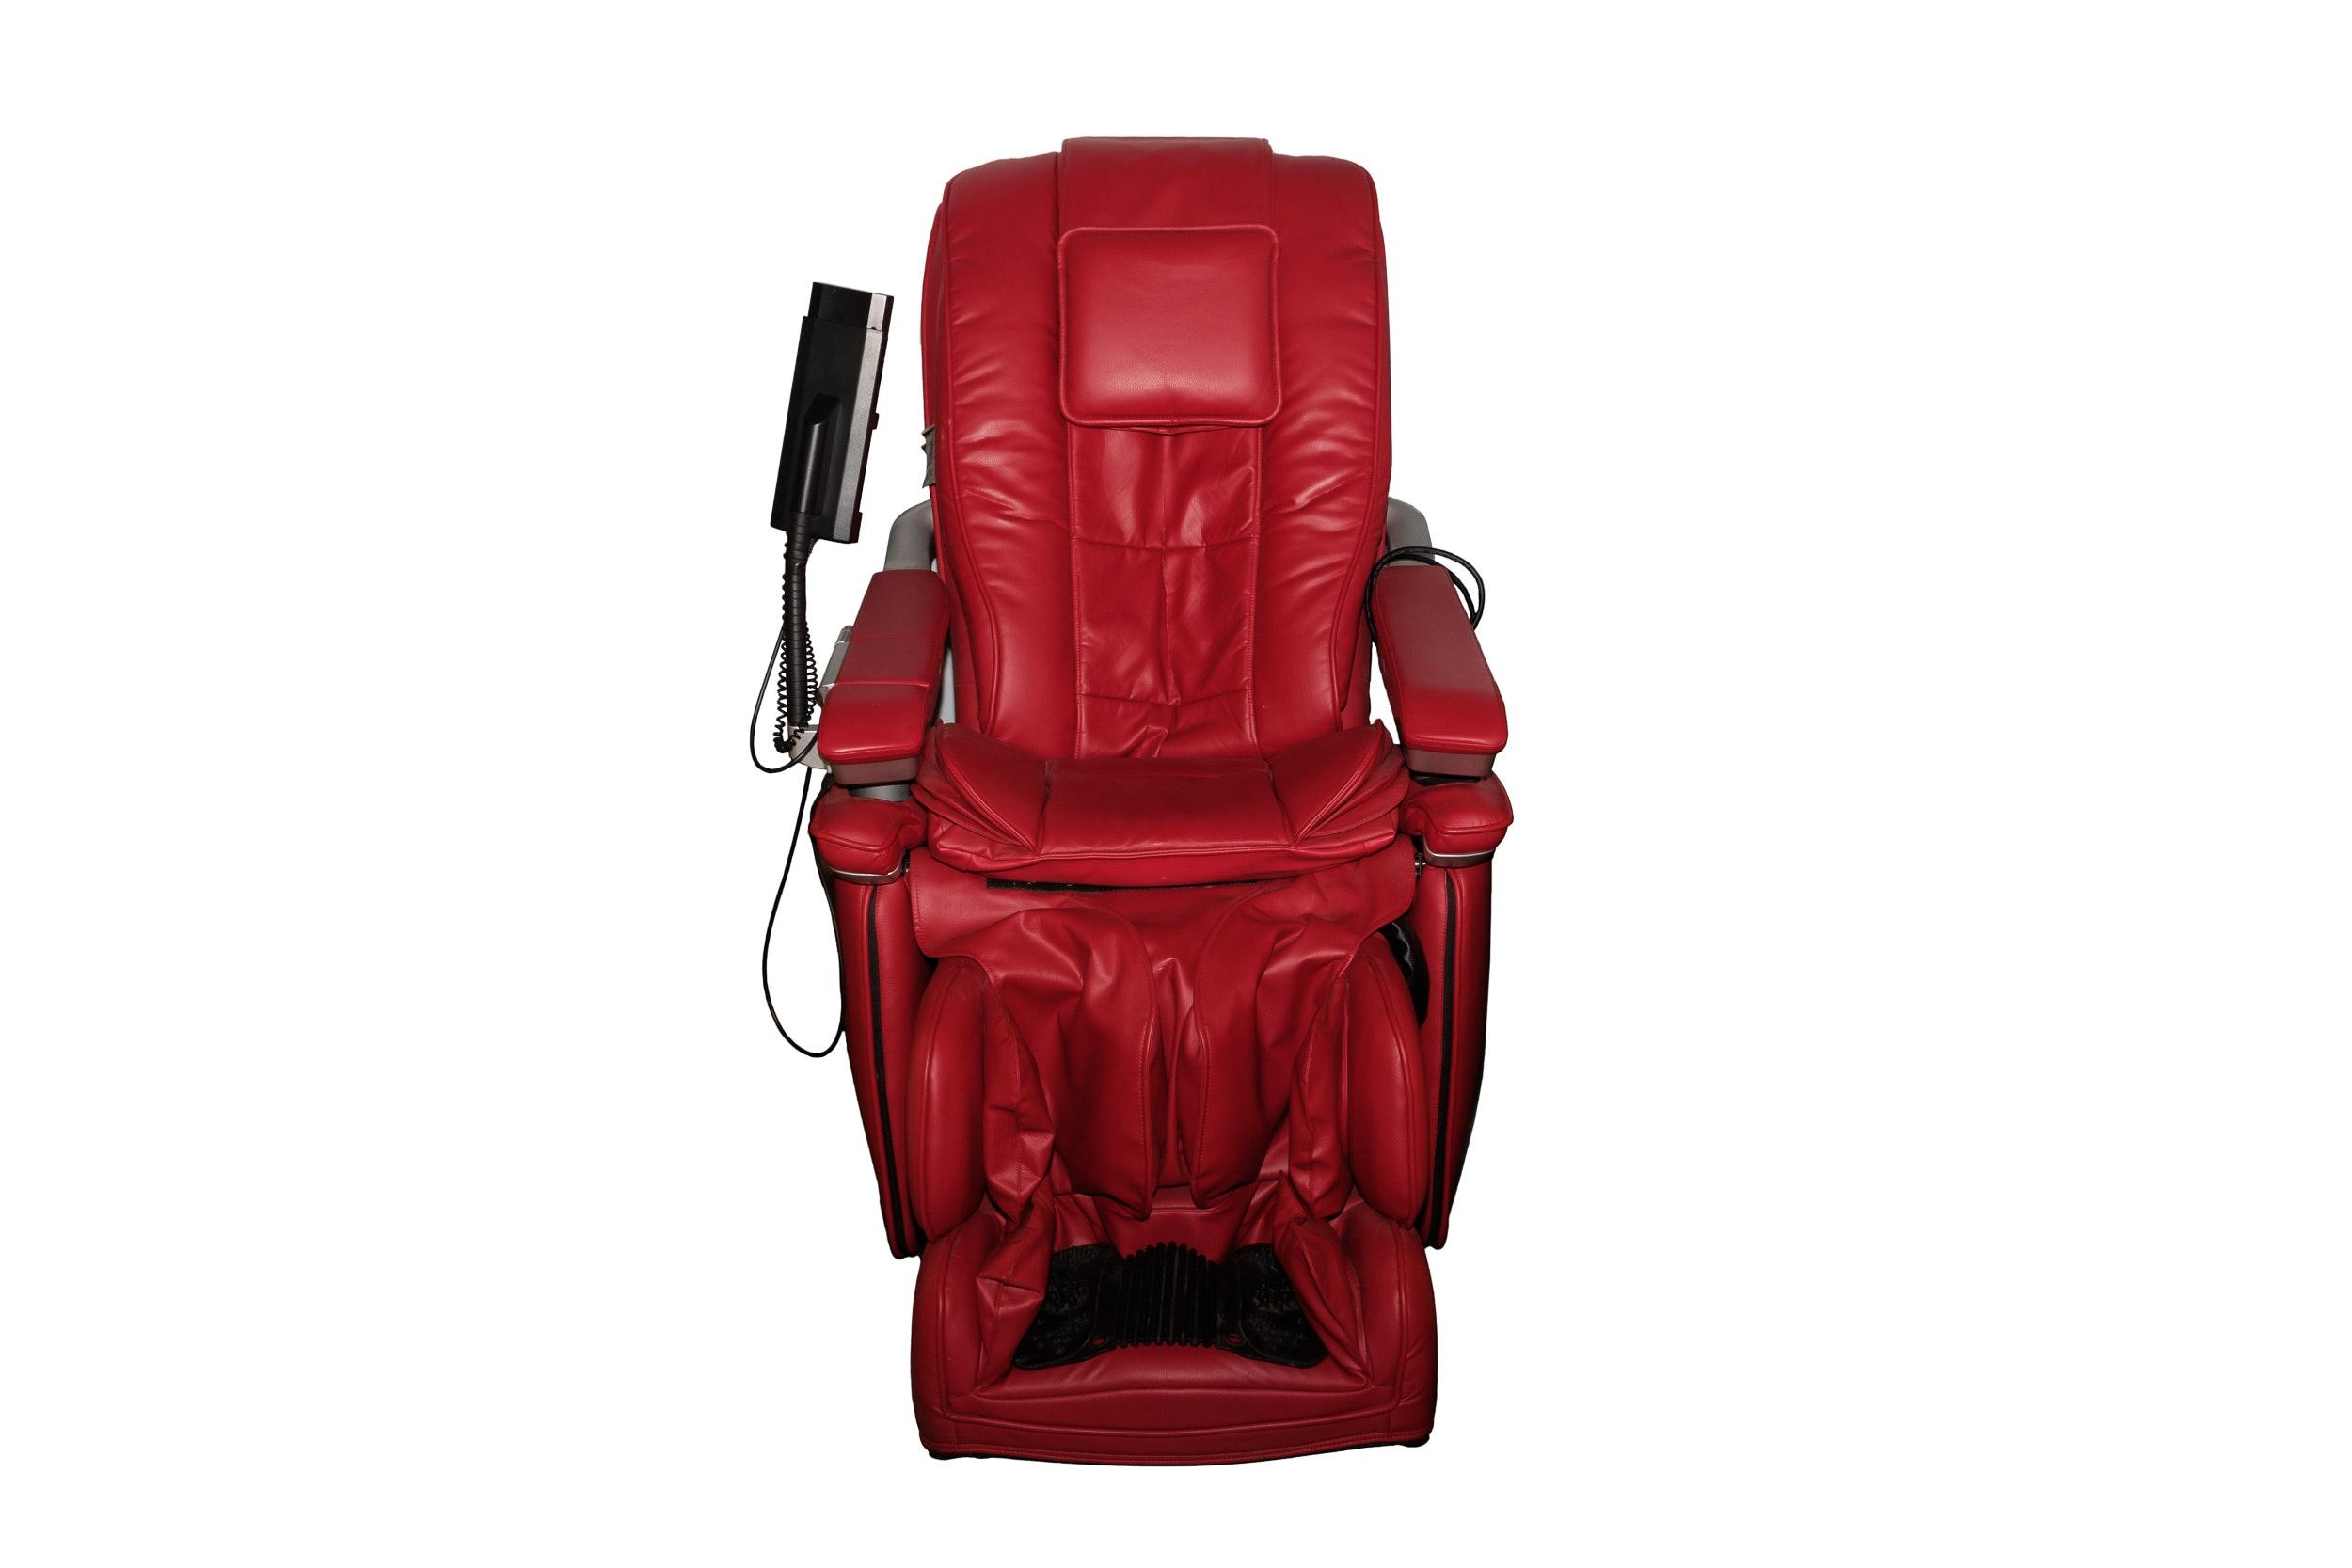 Inada Robostic Massage Chair